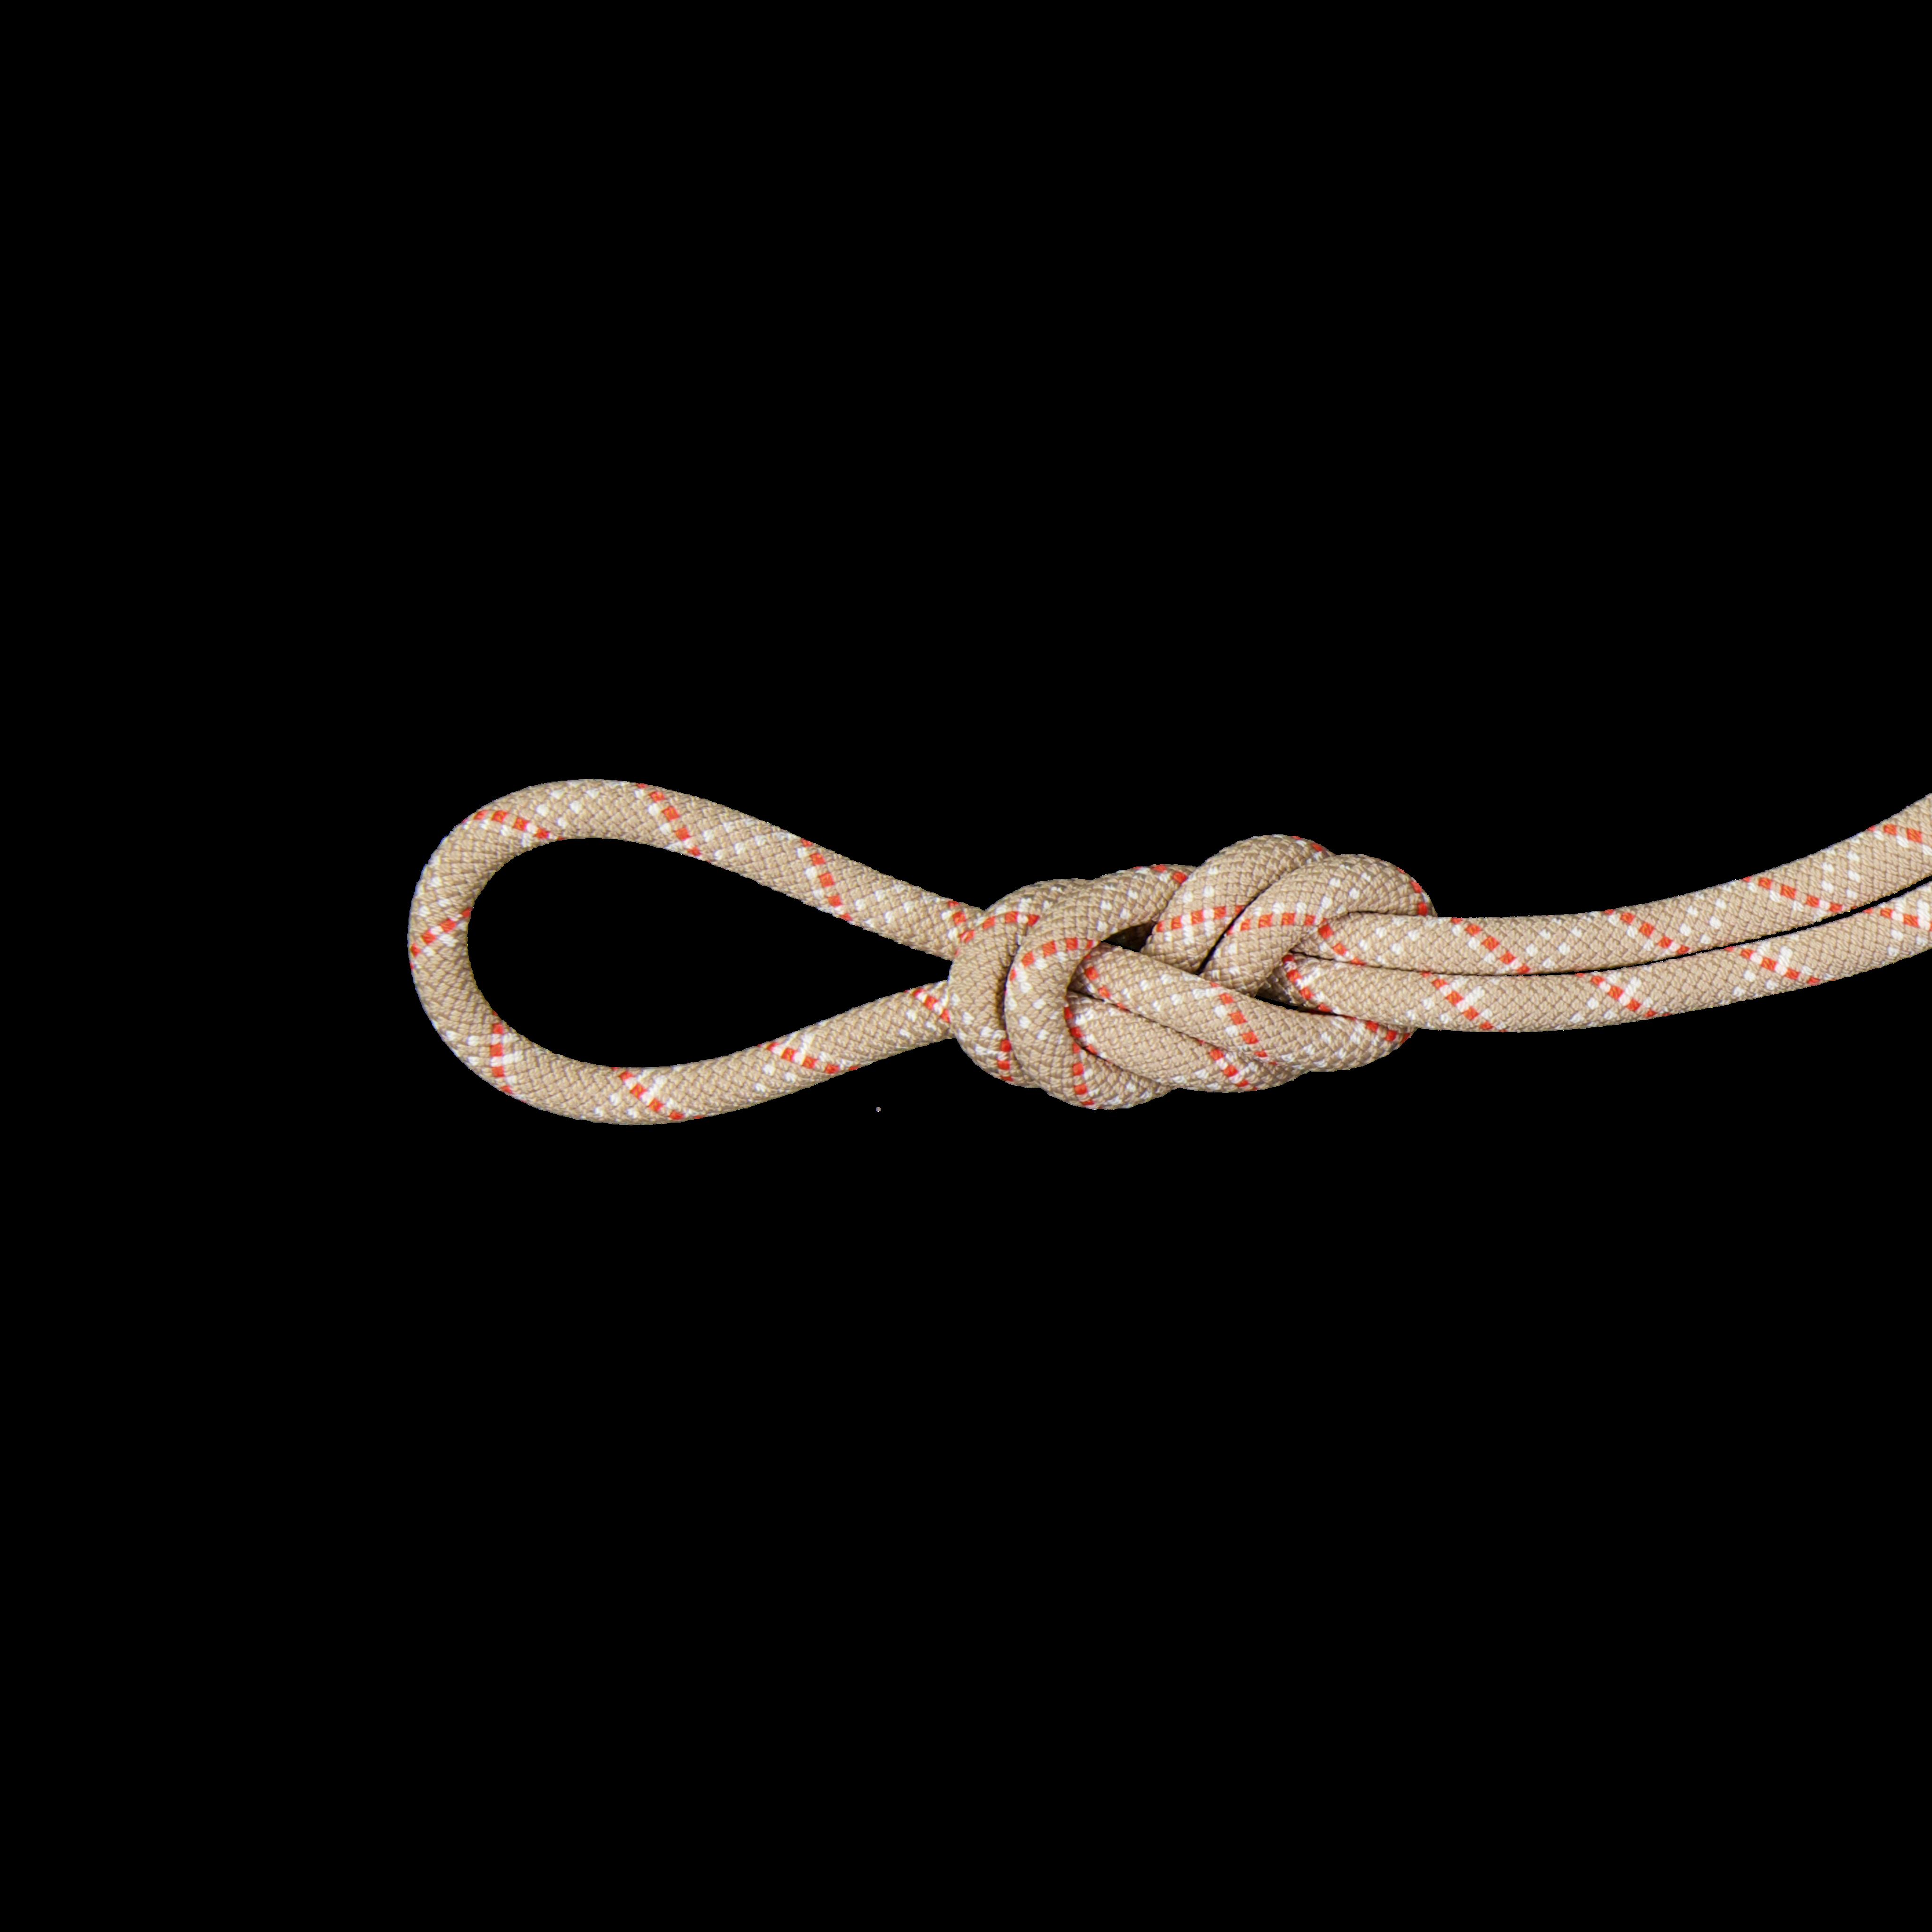 9.5 Gym Classic Rope - 50 m, Classic Standard, desert-white thumbnail